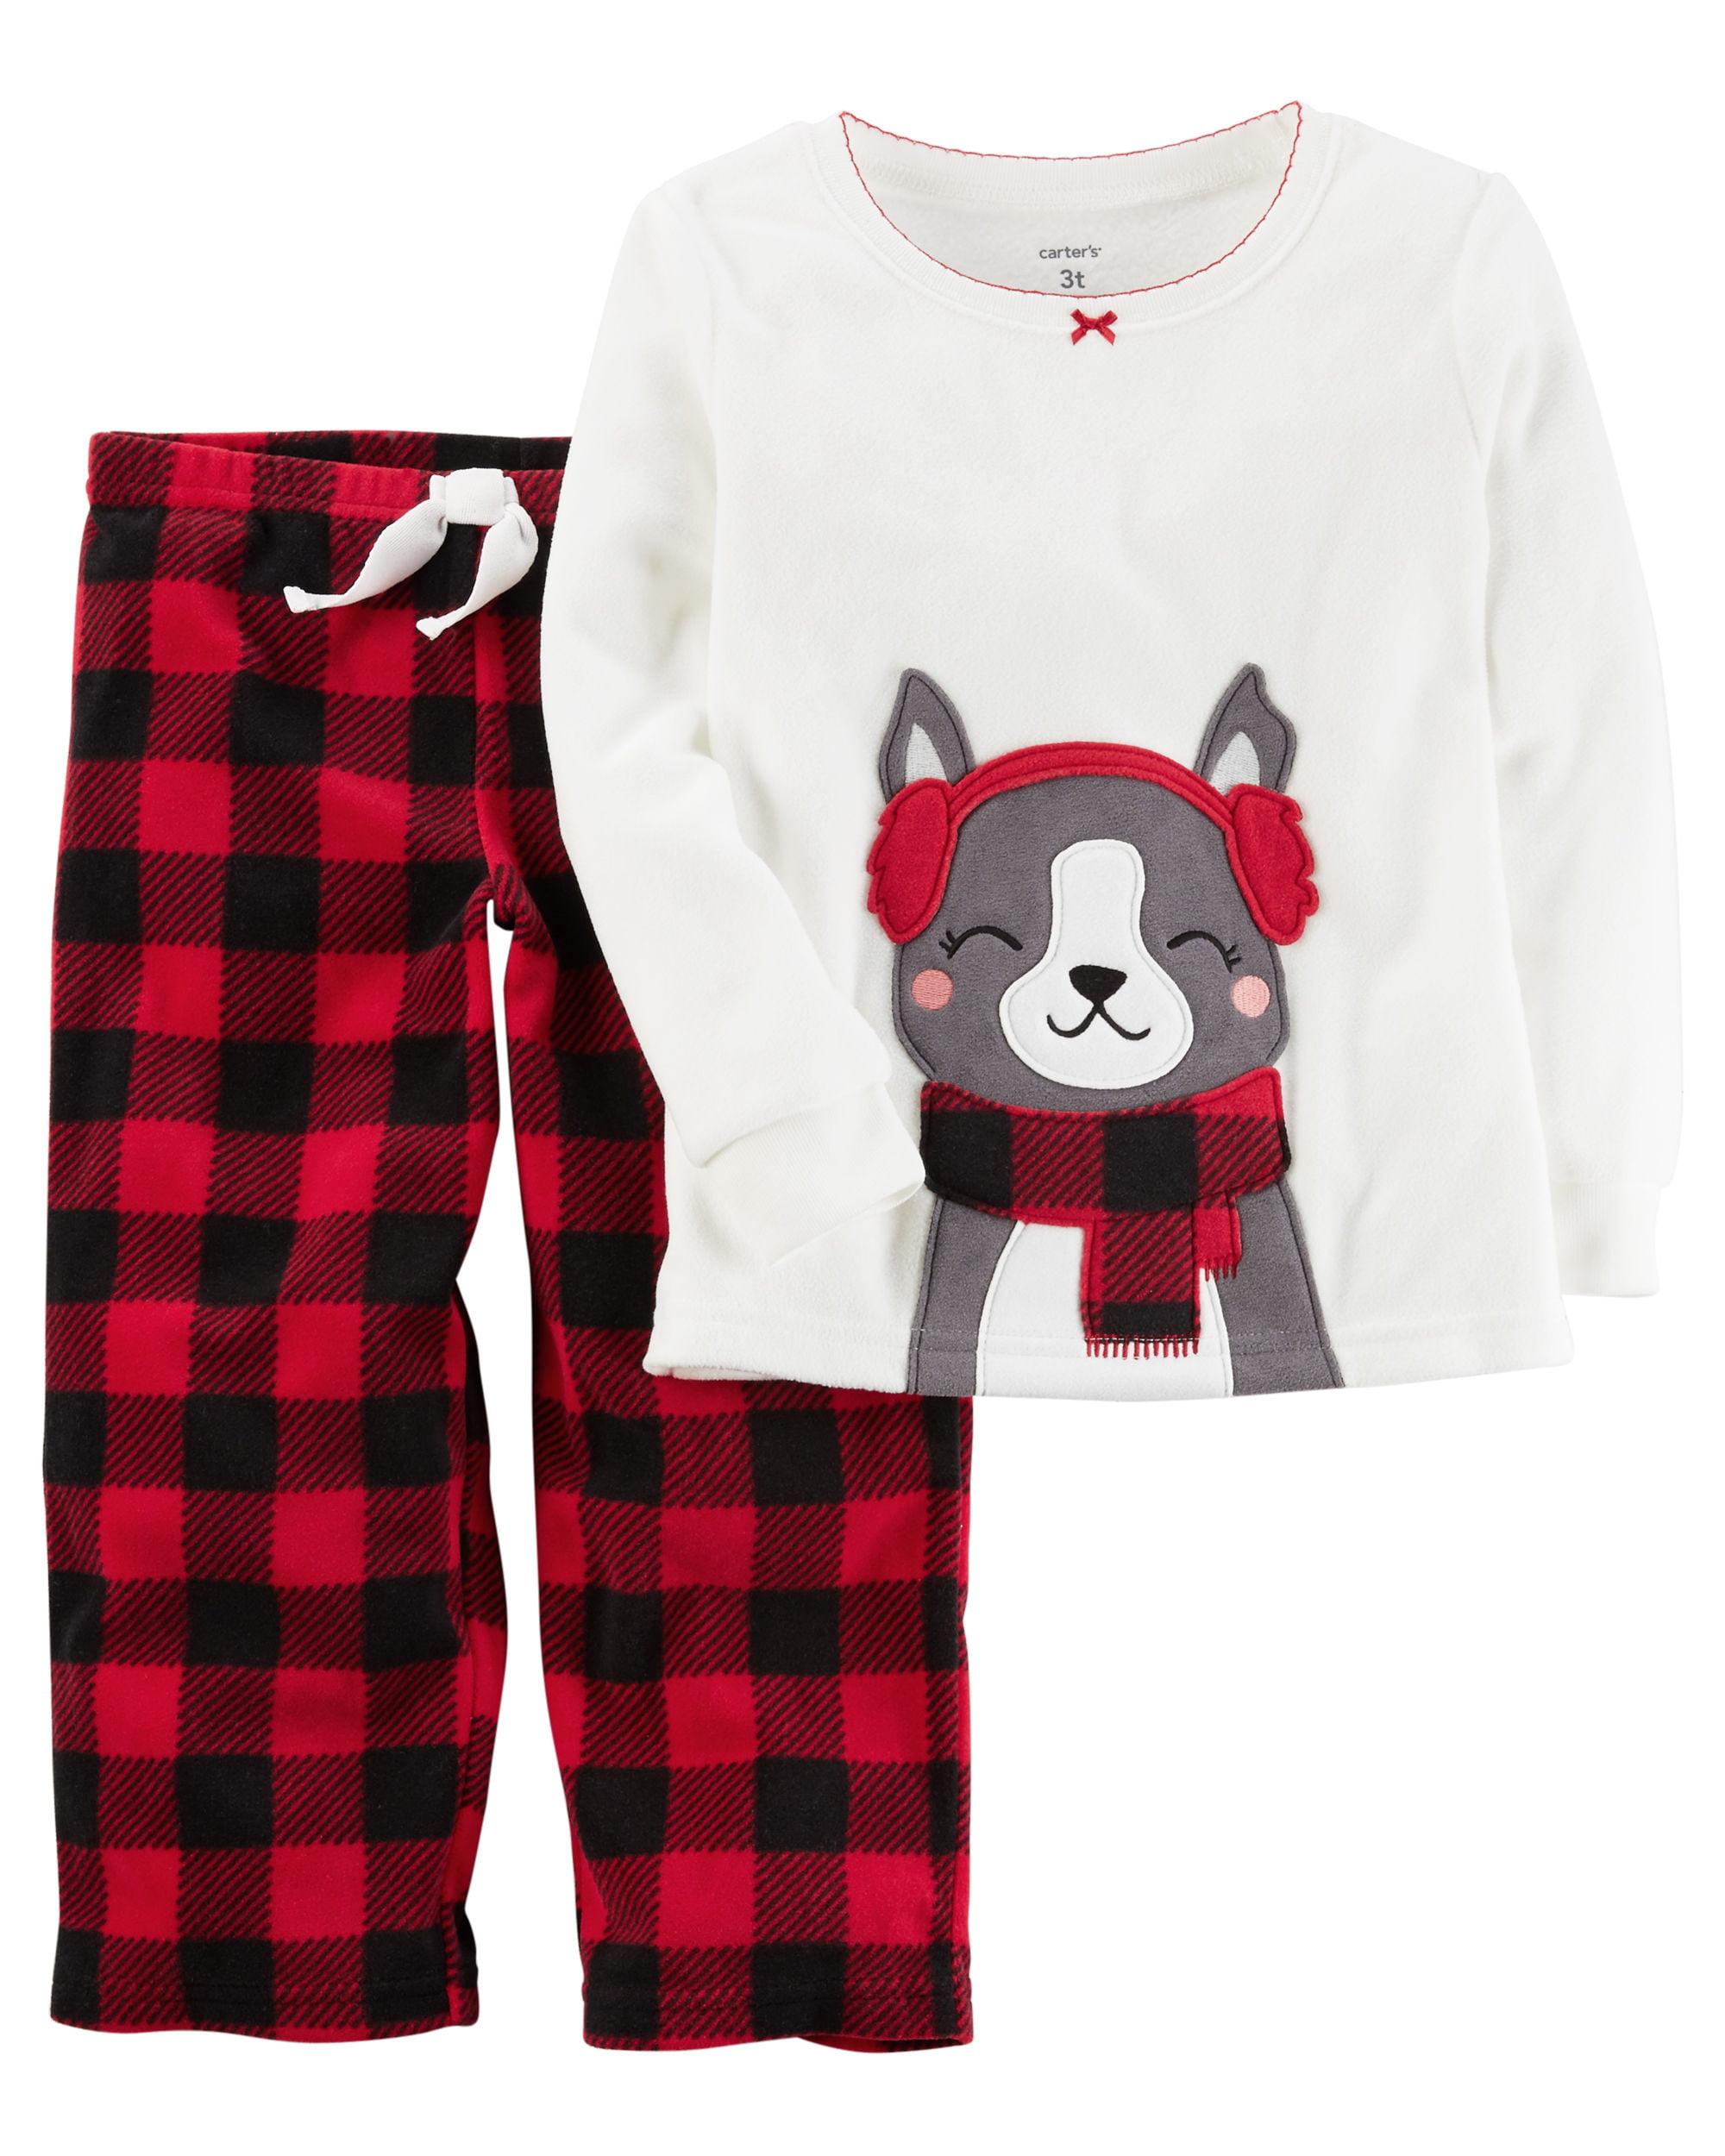 Carter's Big Girls' Holiday Fleece 2 Piece Pajama Set- Plaid Dog -24 Months